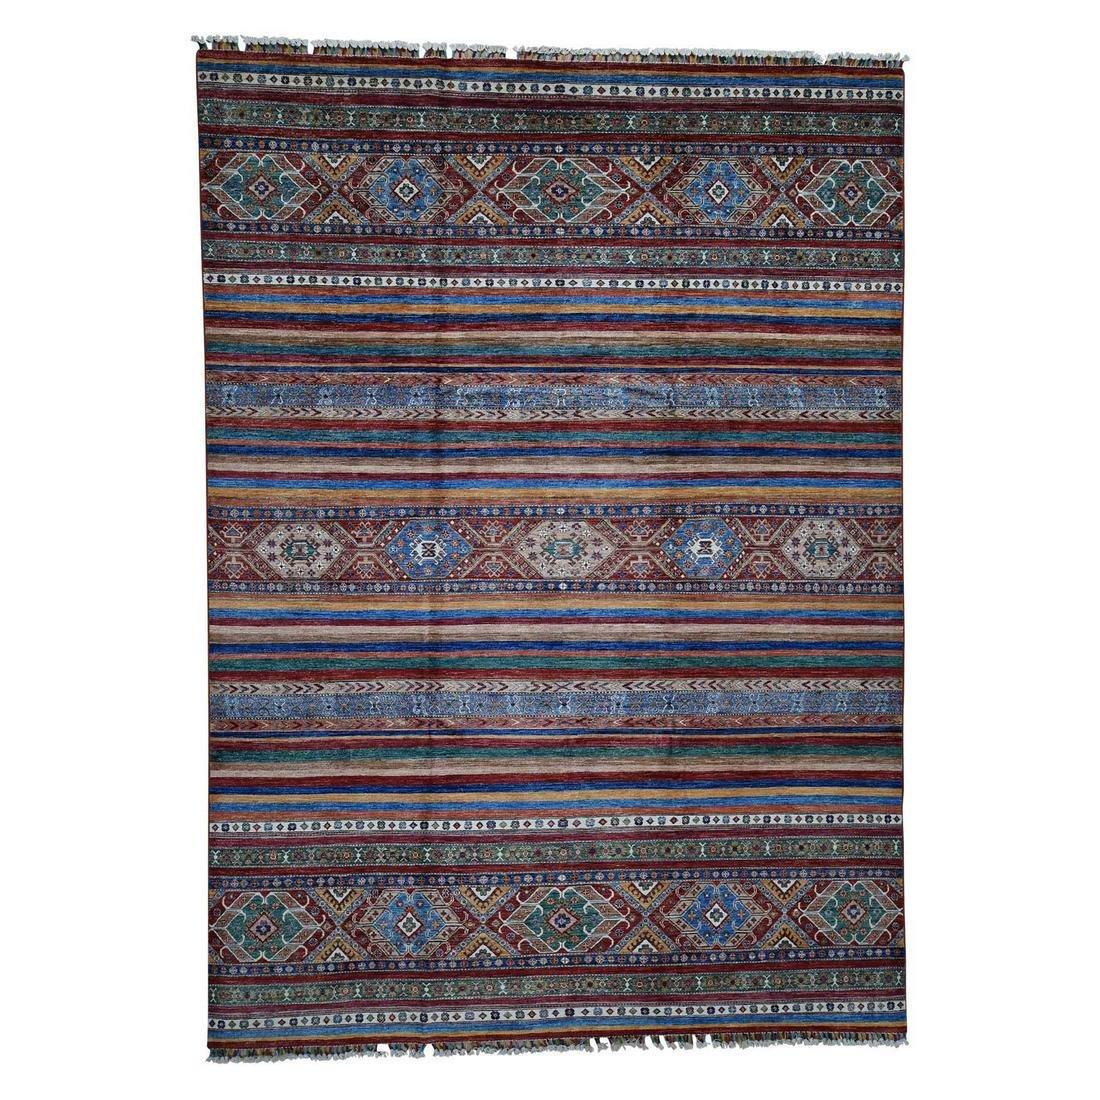 Super Kazak Khorjin Design Hand-Knotted Pure Wool Rug